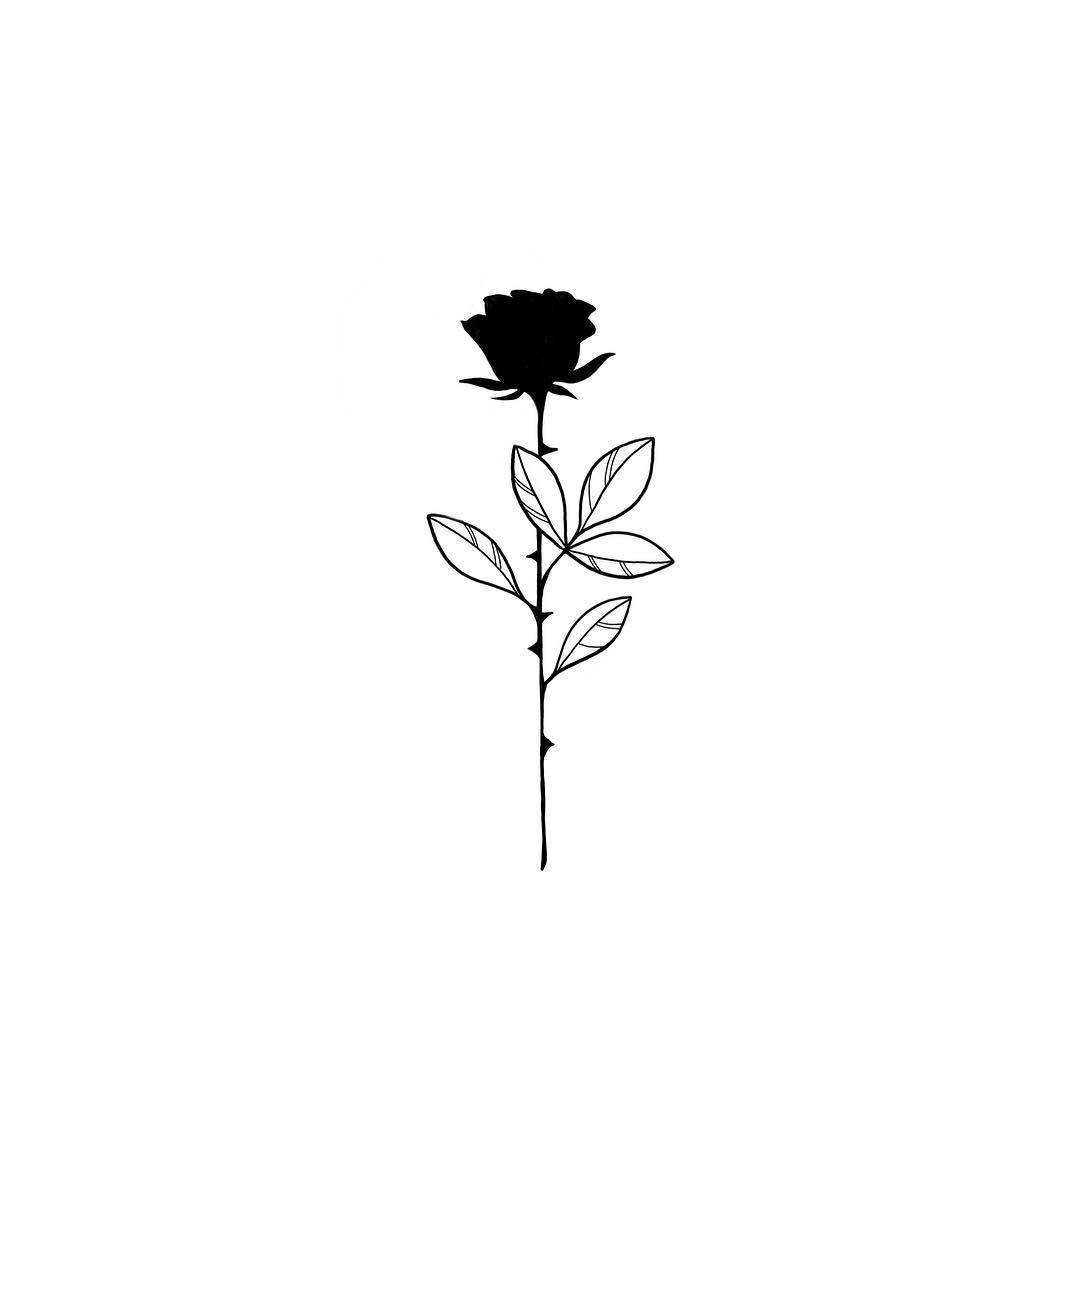 d37a5b33c75617de7f1a46d2a95d0fd0 » Aesthetic Rose Drawing